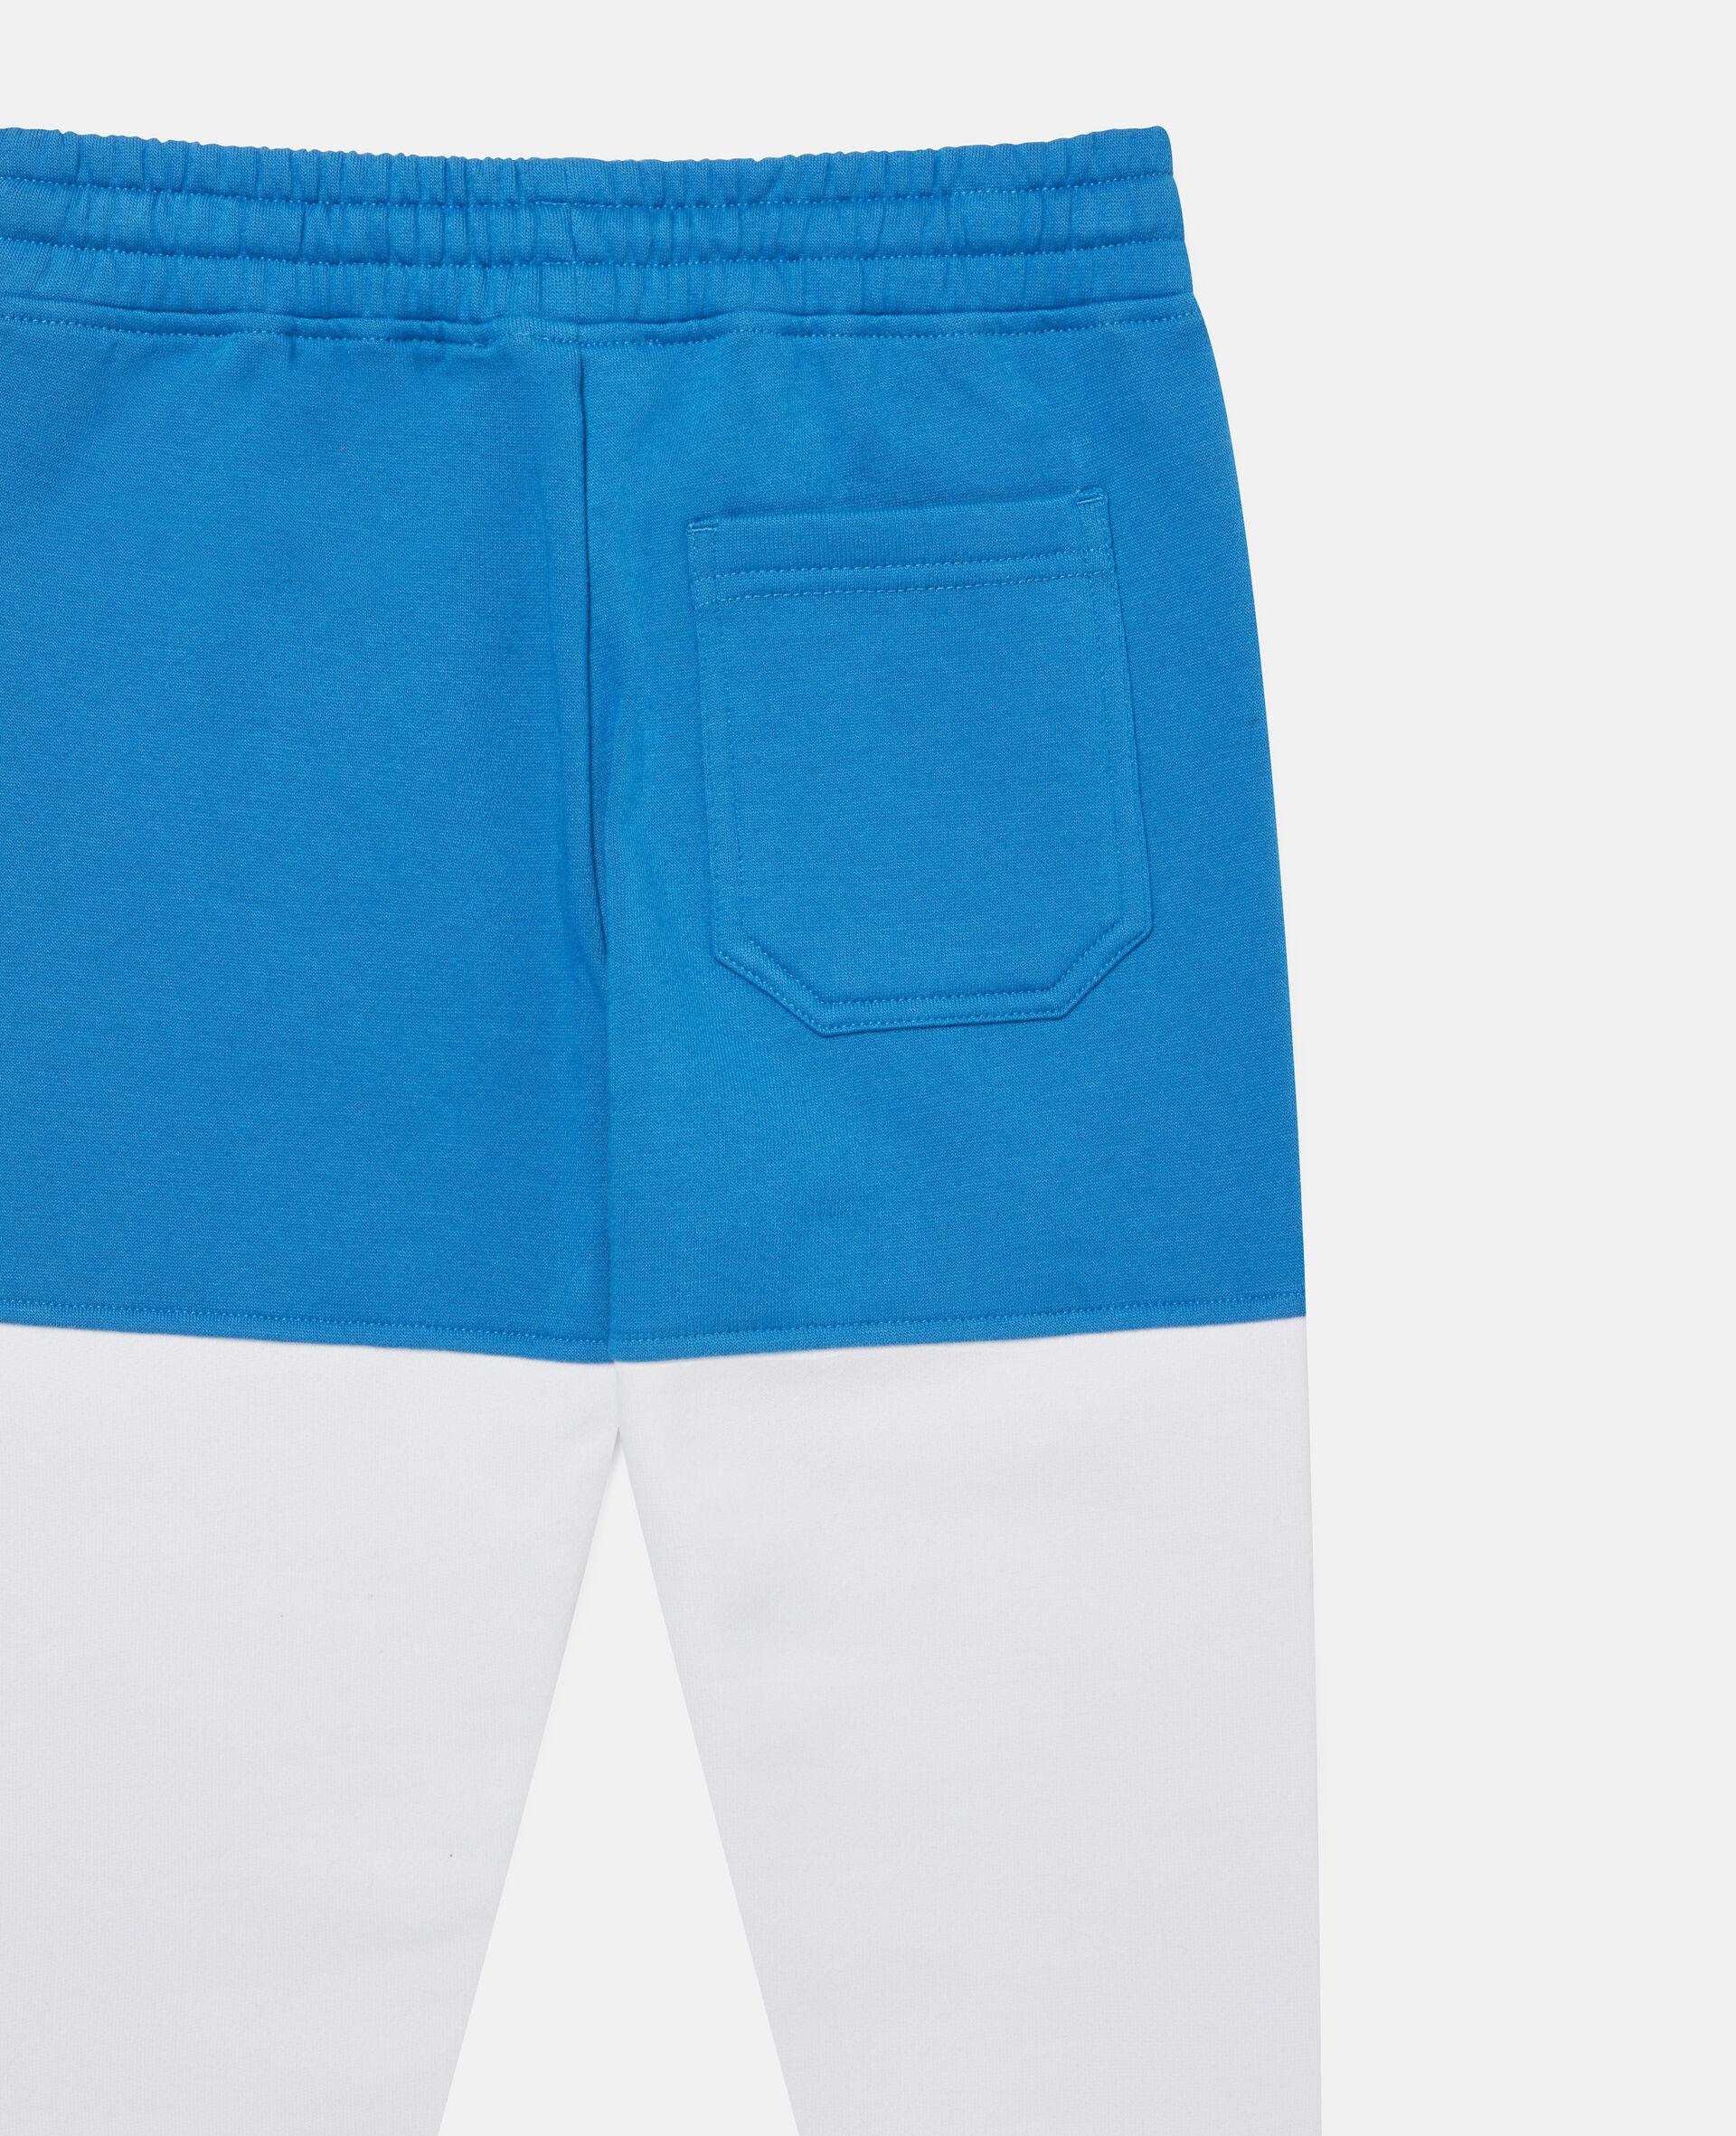 Pantaloni Sportivi a Blocchi di Colore-Fantasia-large image number 2